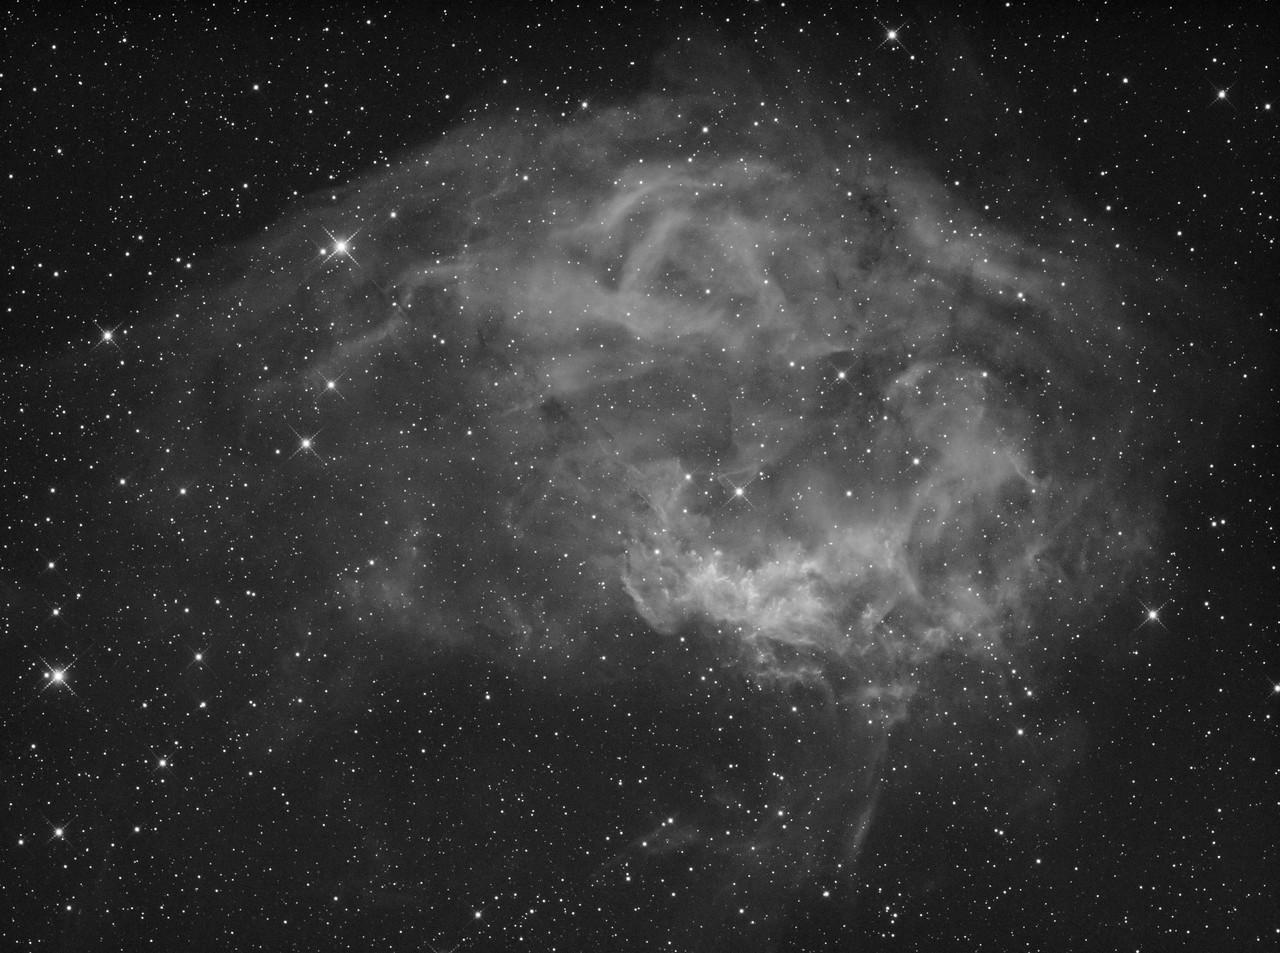 Sh2-261 Lower's Nebula in Orion